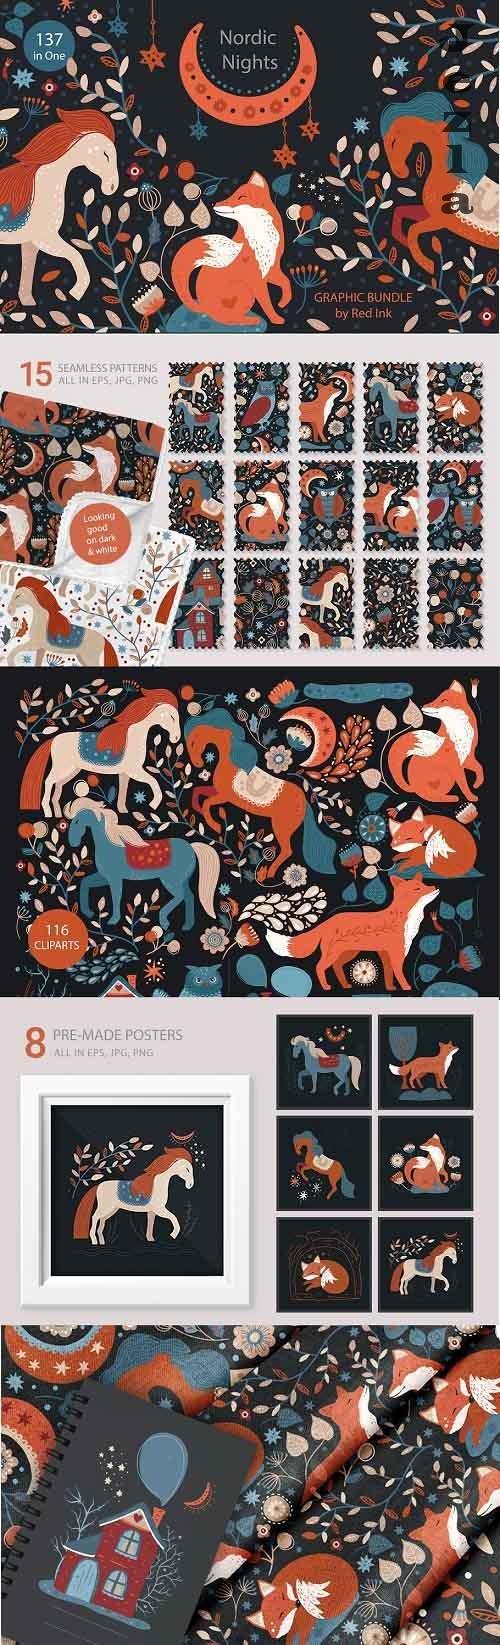 Nordic Nights. Boho Graphic Bundle - 5431648